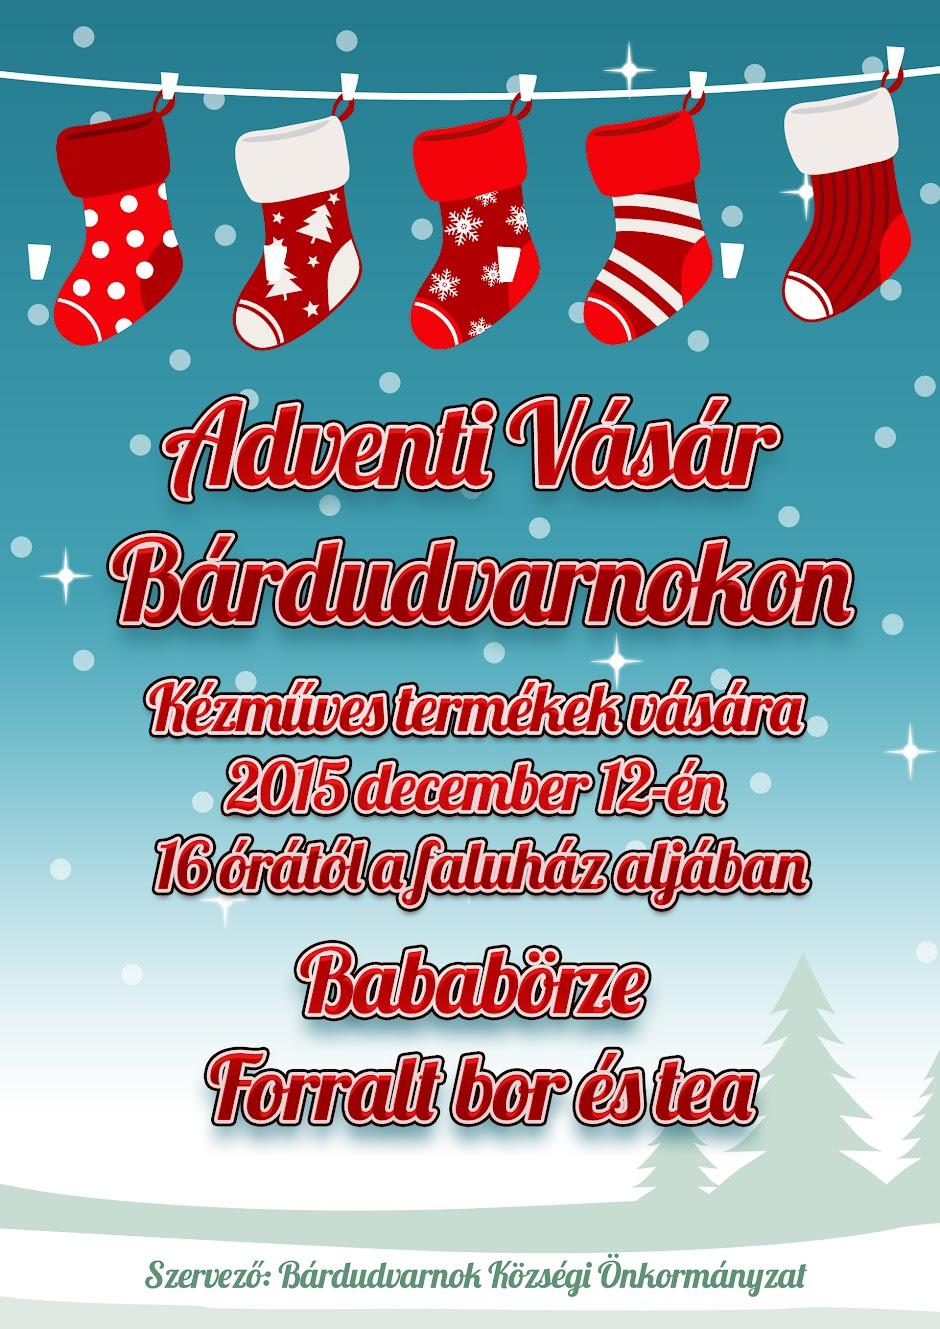 Adventi vásár 2015 Bárdudvarnokon plakát